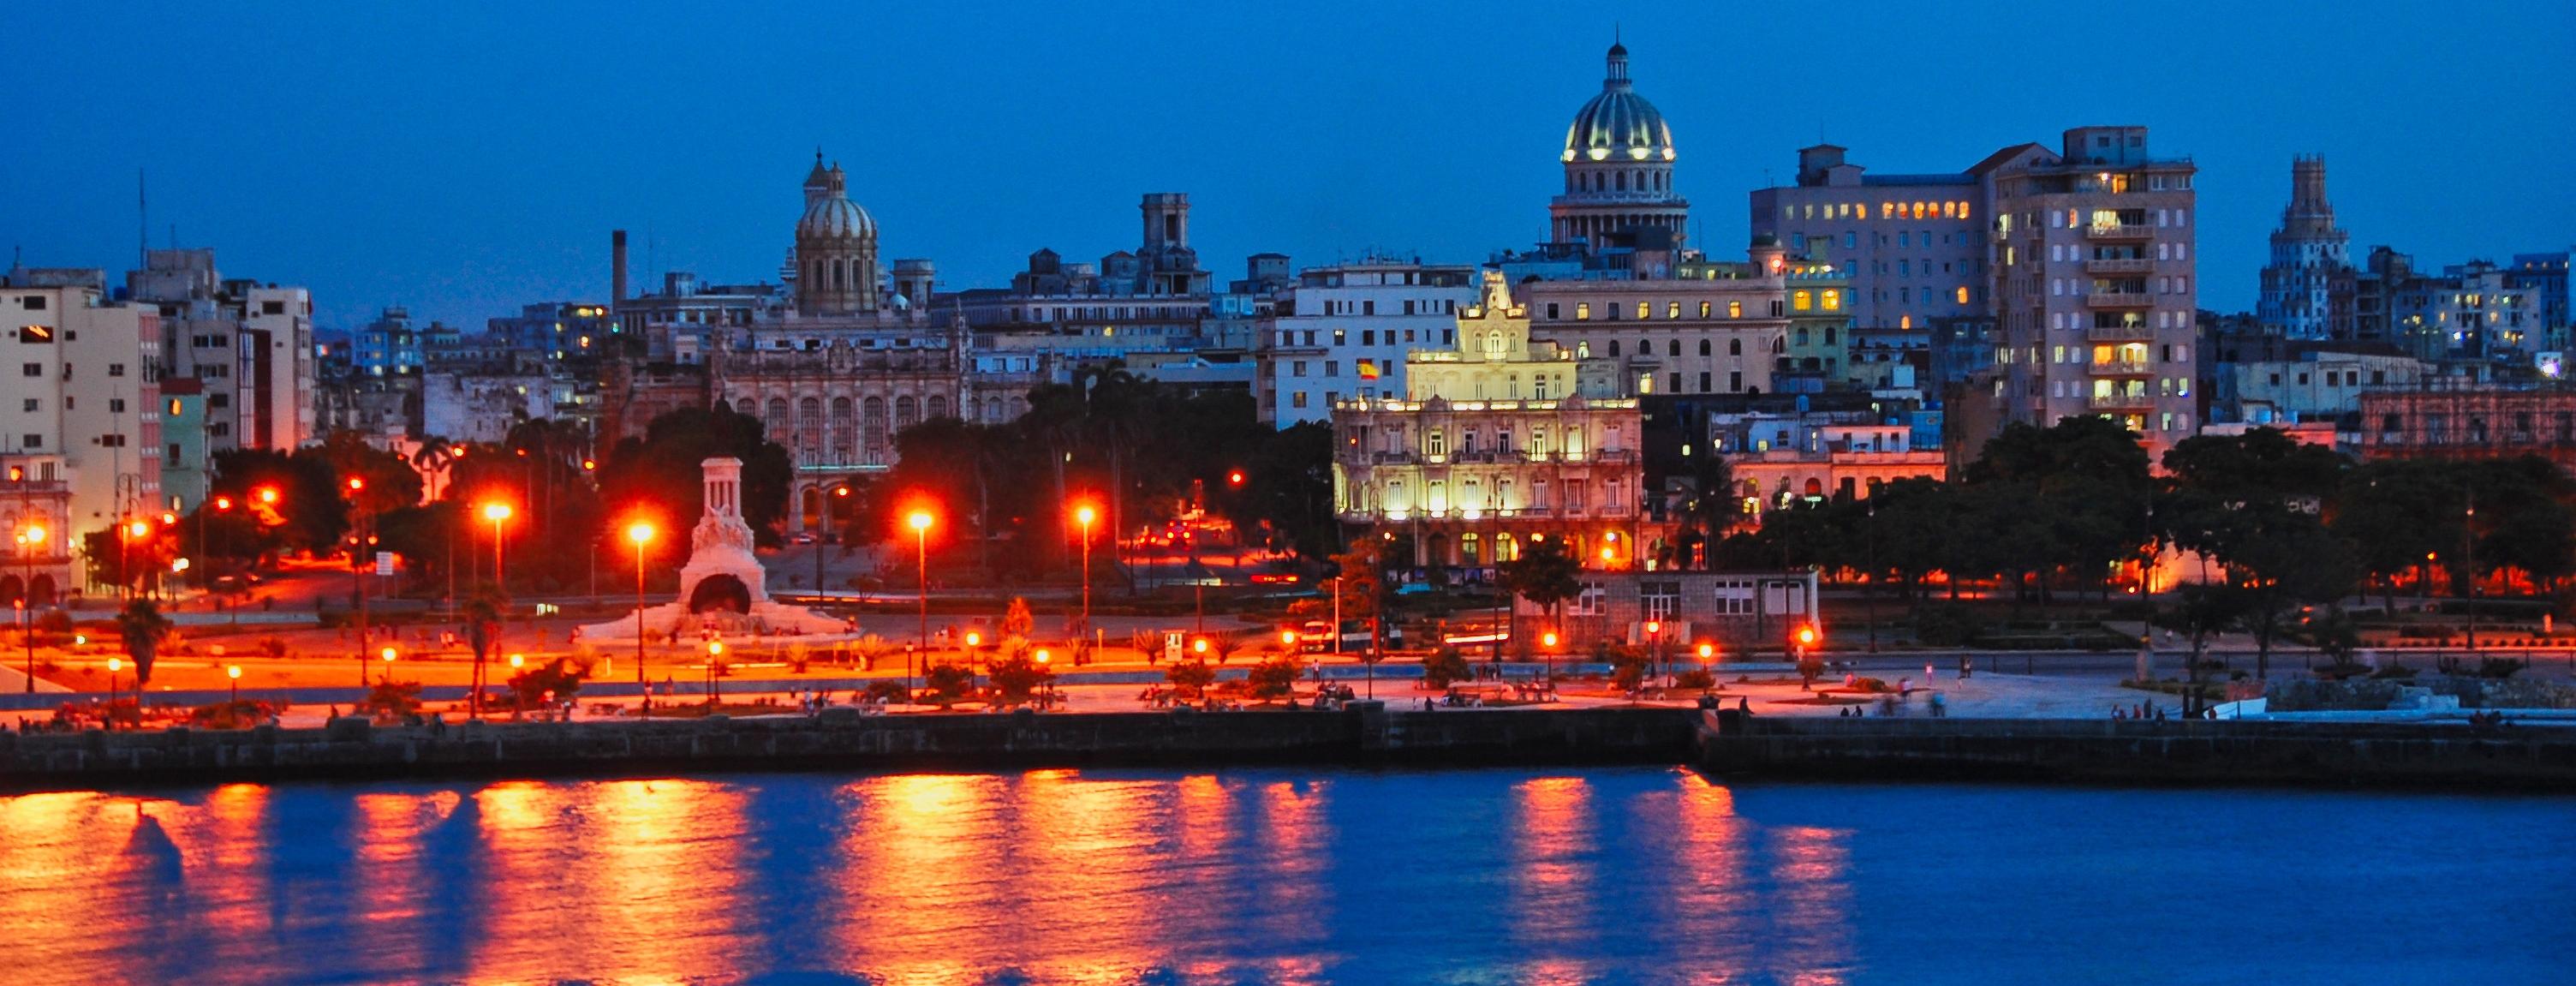 La Habana Vieja - Wikipedia, la enciclopedia libre